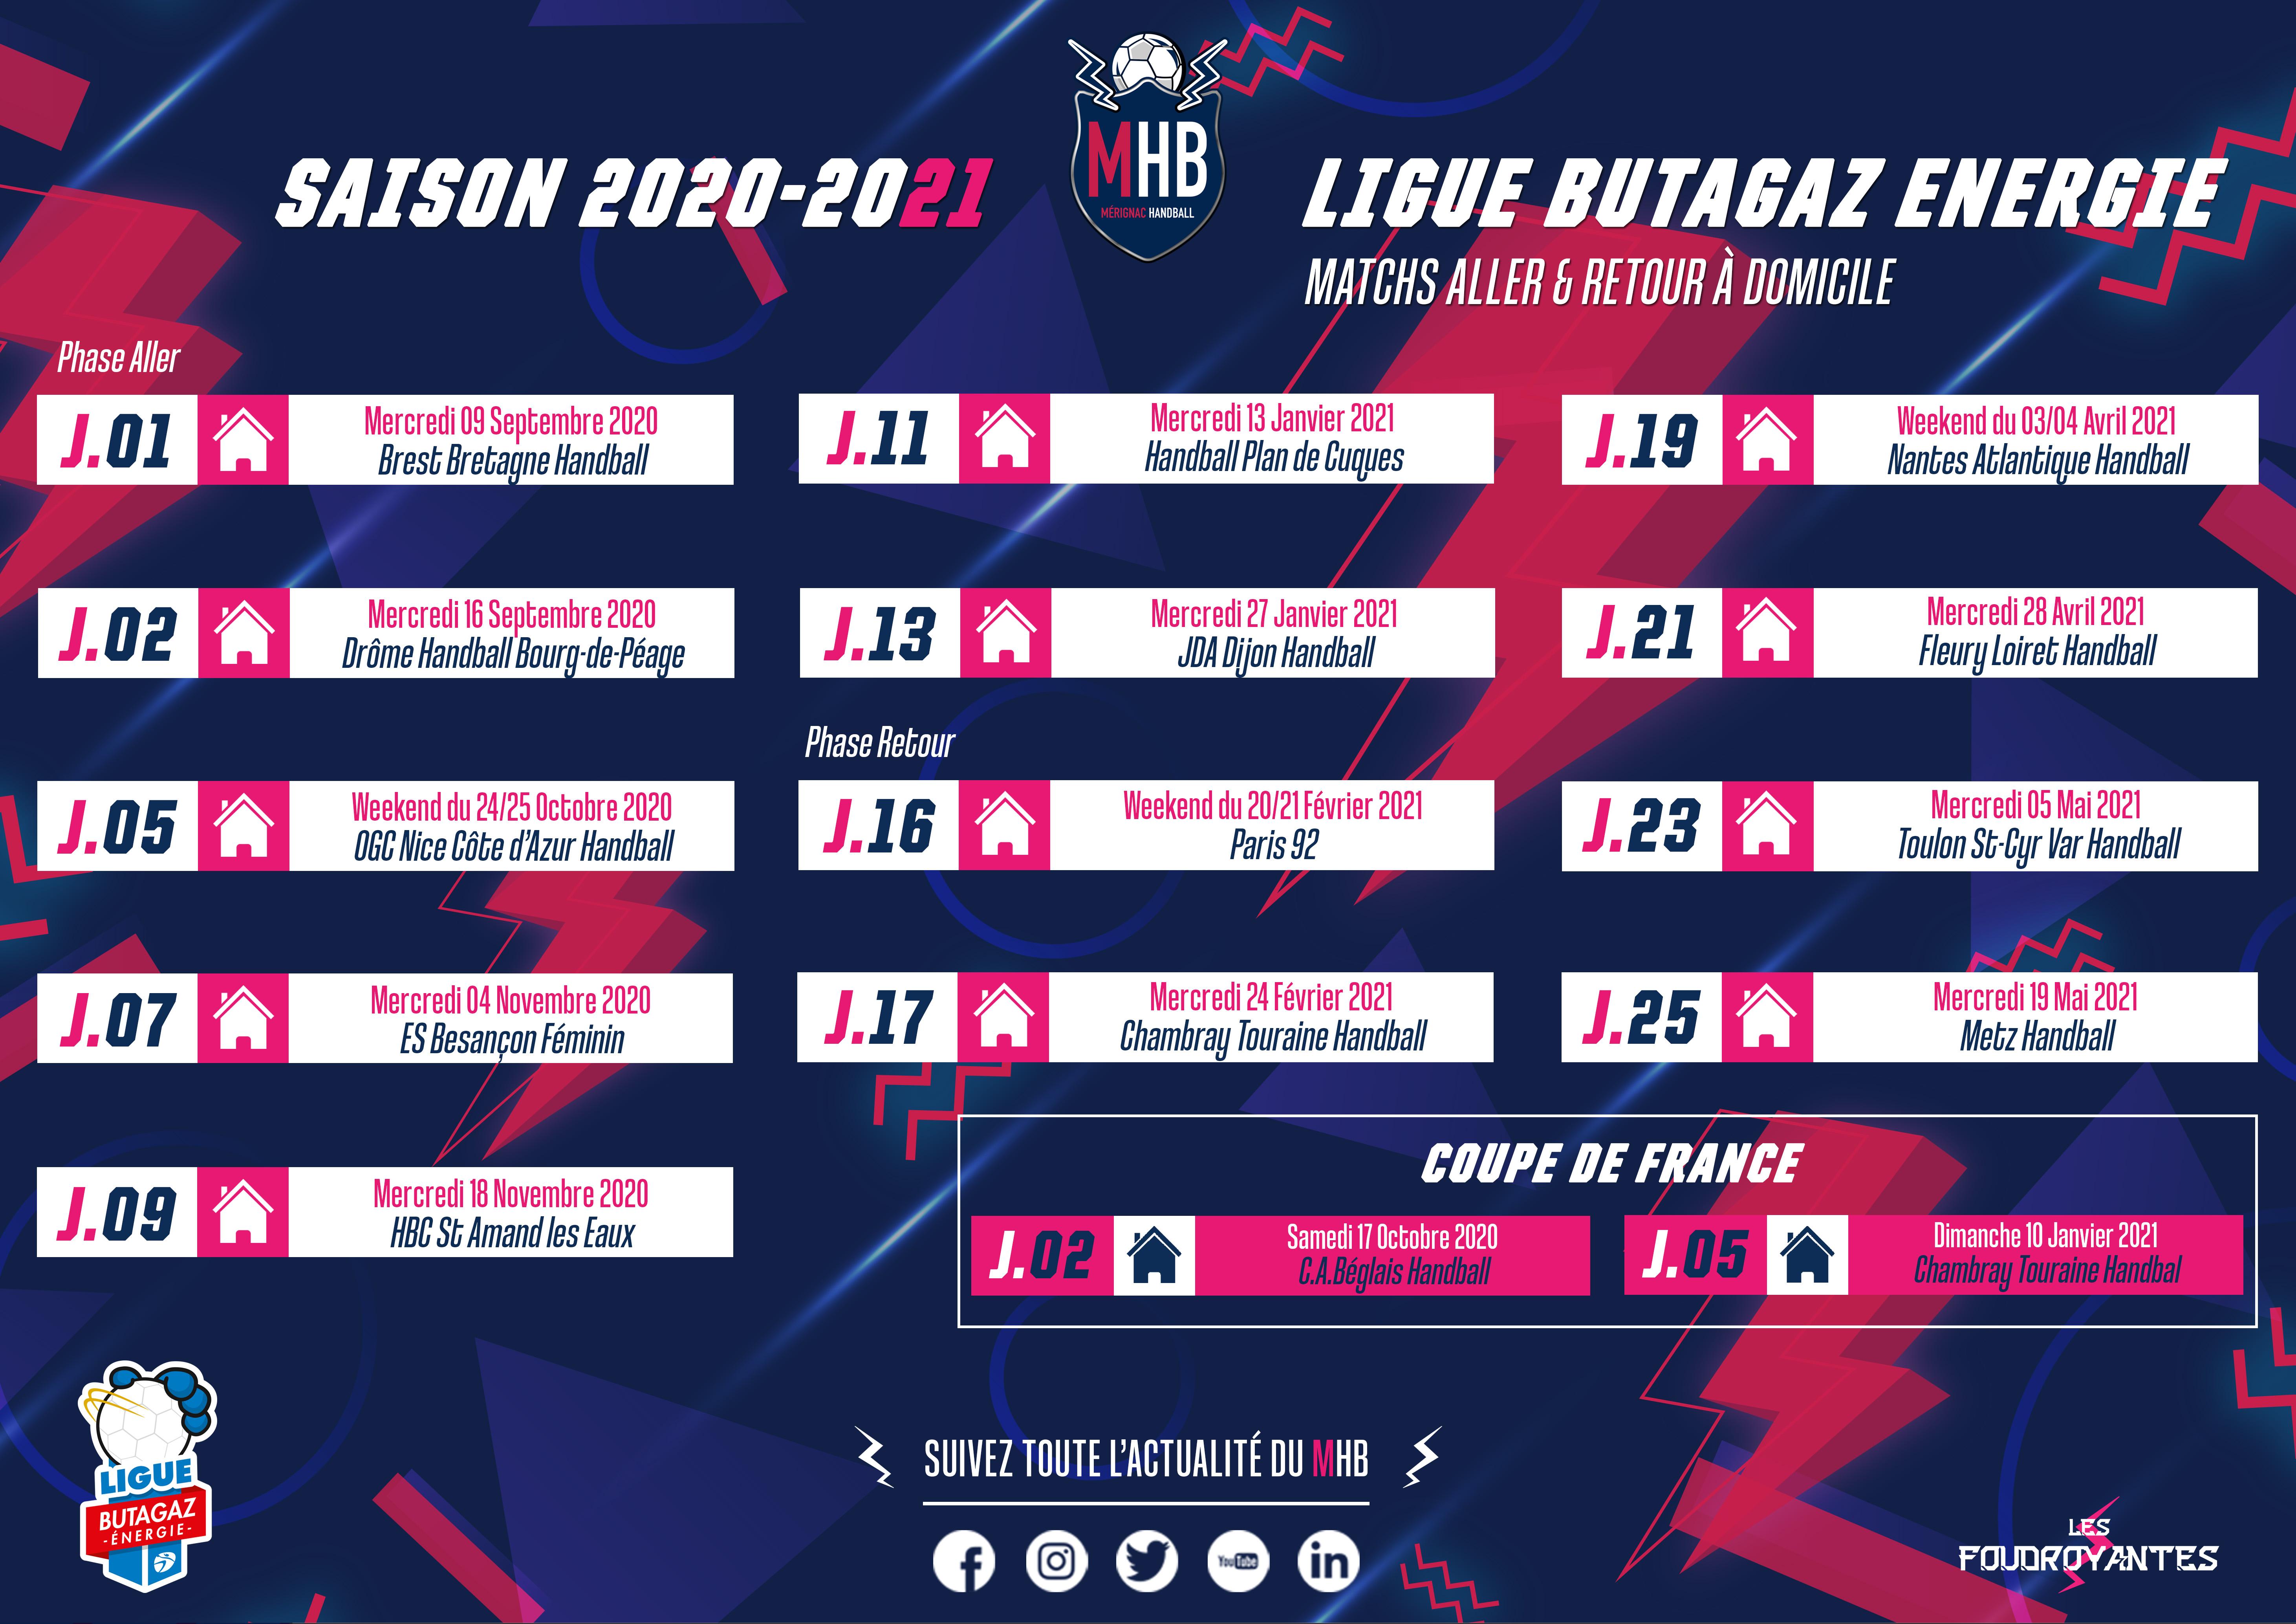 Calendrier Domicile Saison 2020-2021